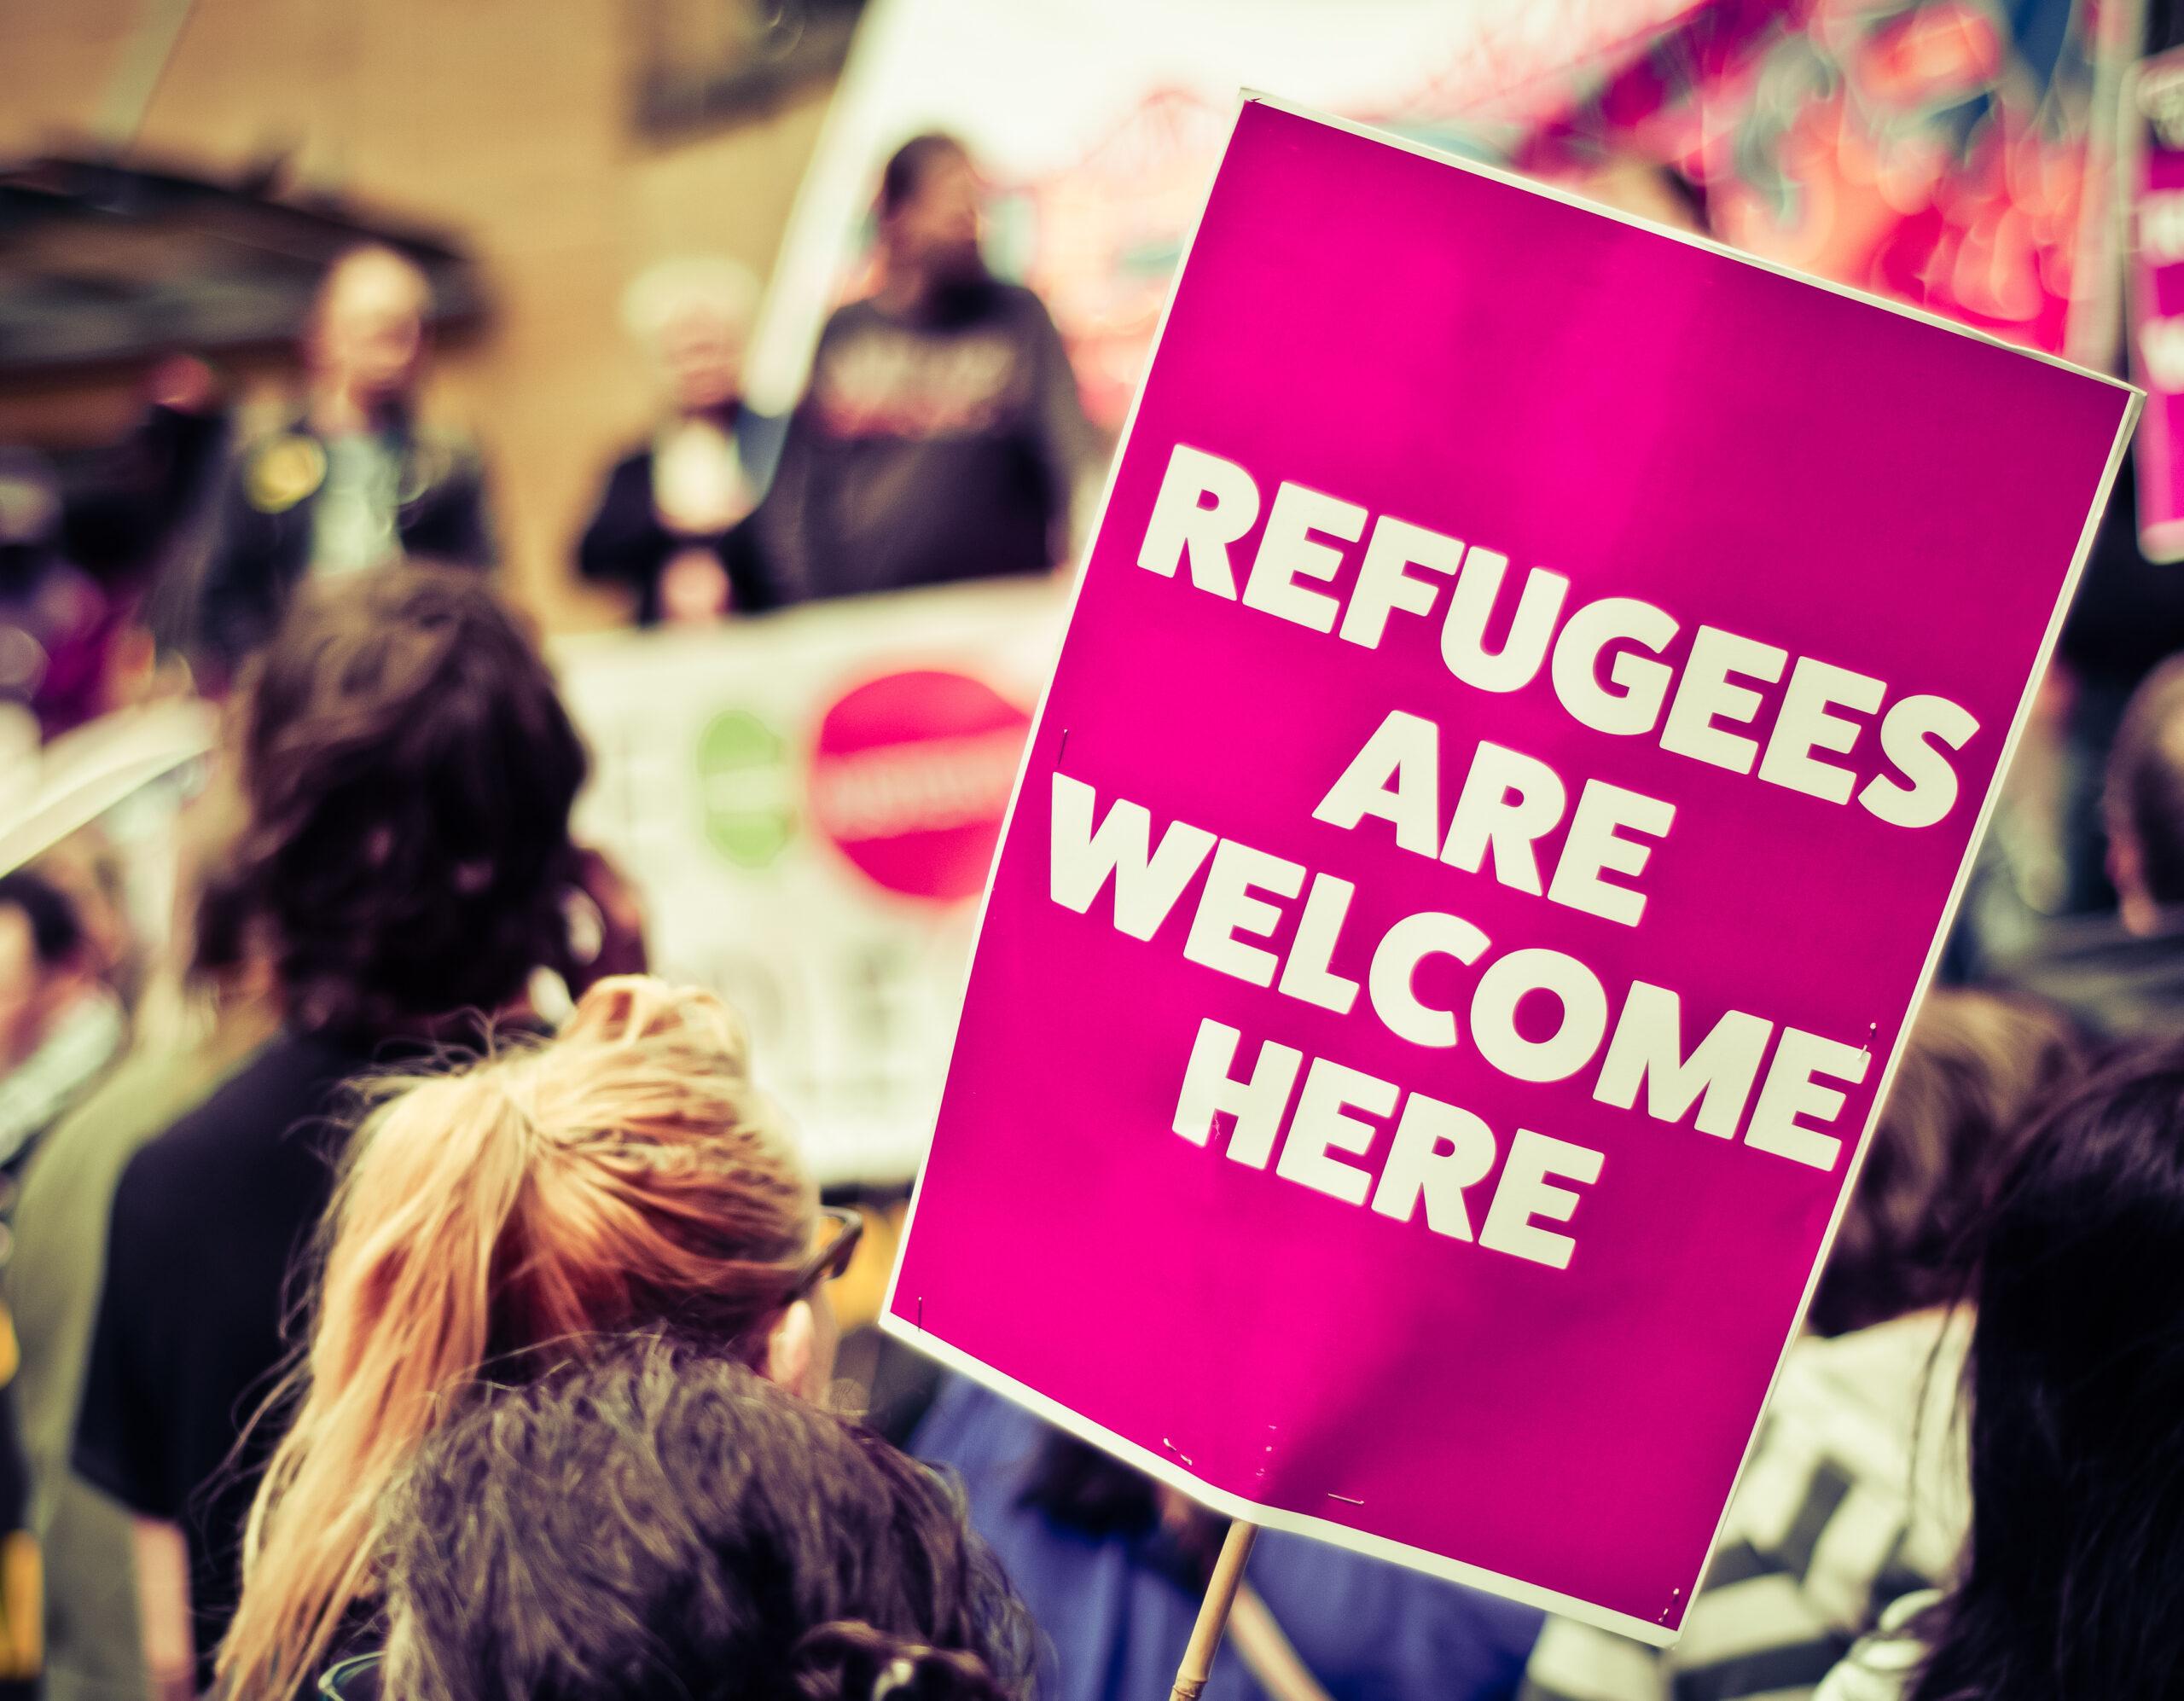 The Refugee Crisis and the Catholic Response